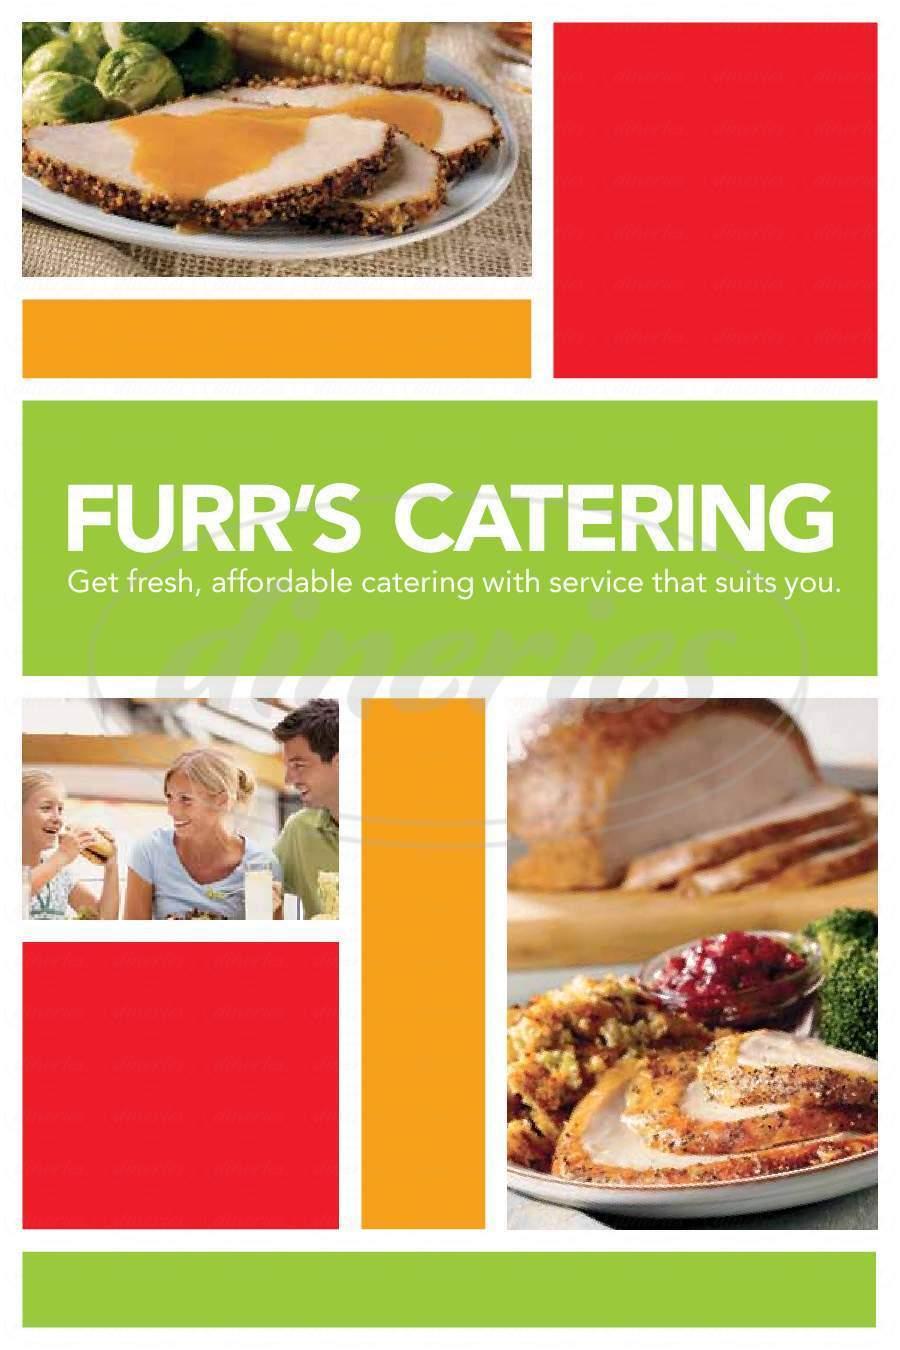 menu for Furr's 317